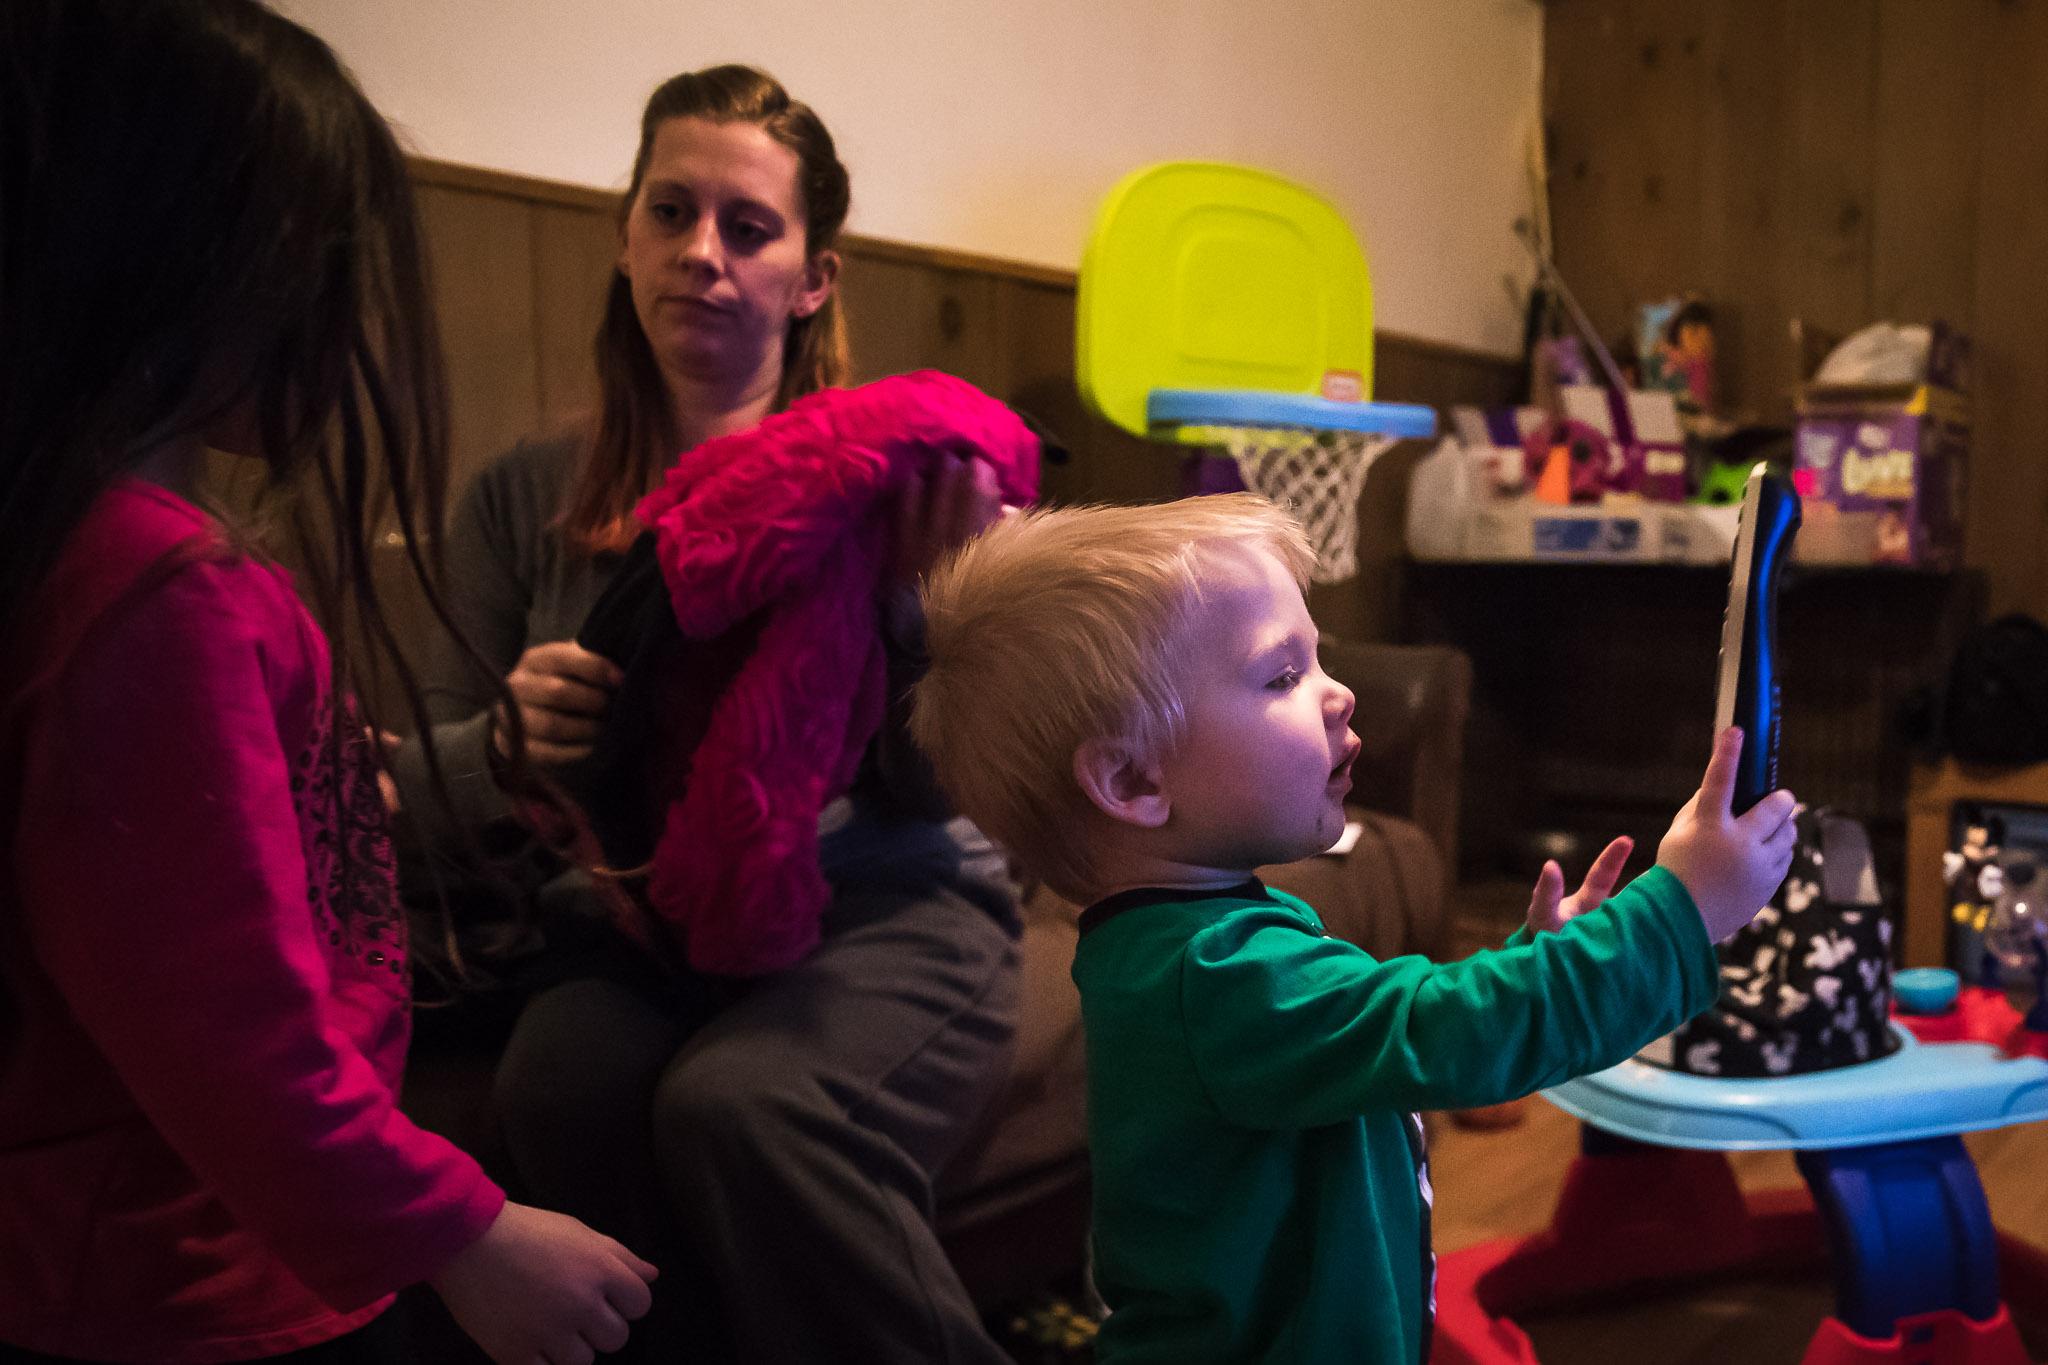 working-parents-home-evening-photos